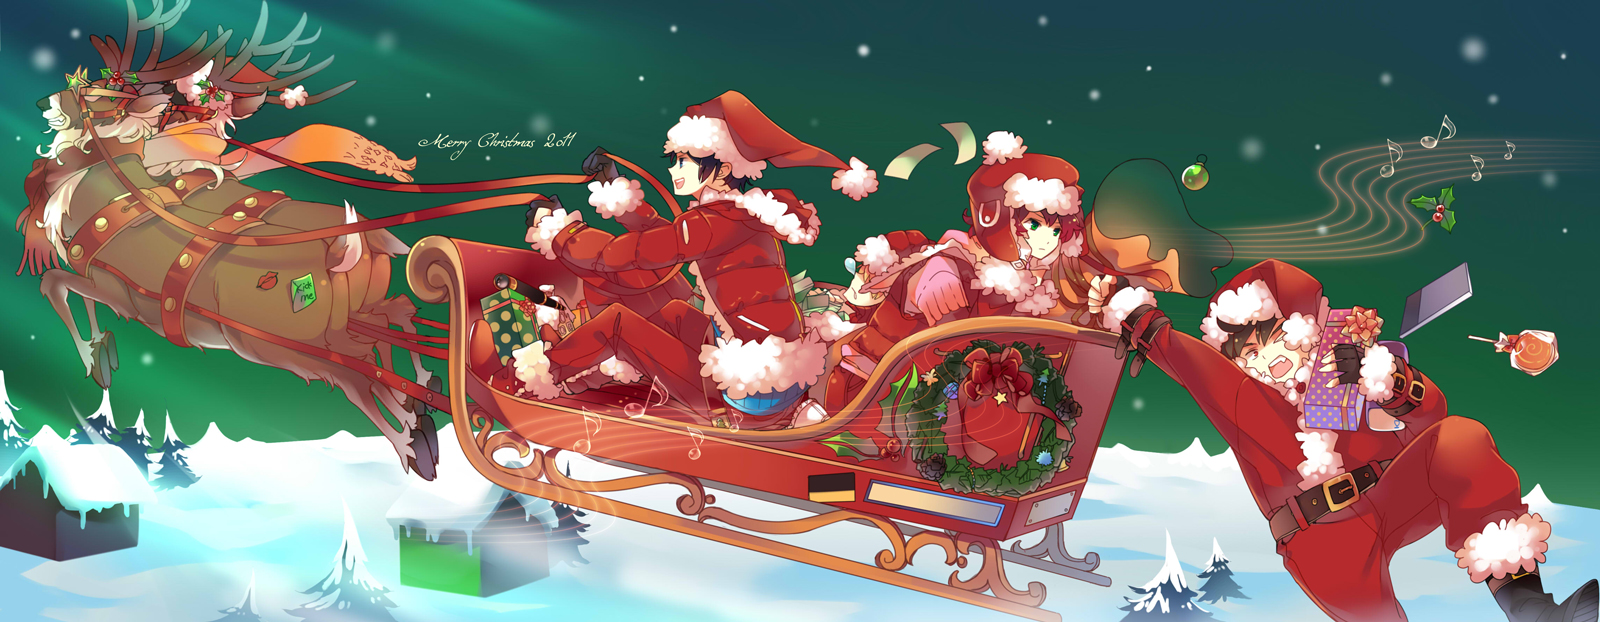 South Park Image #918197 - Zerochan Anime Image Board